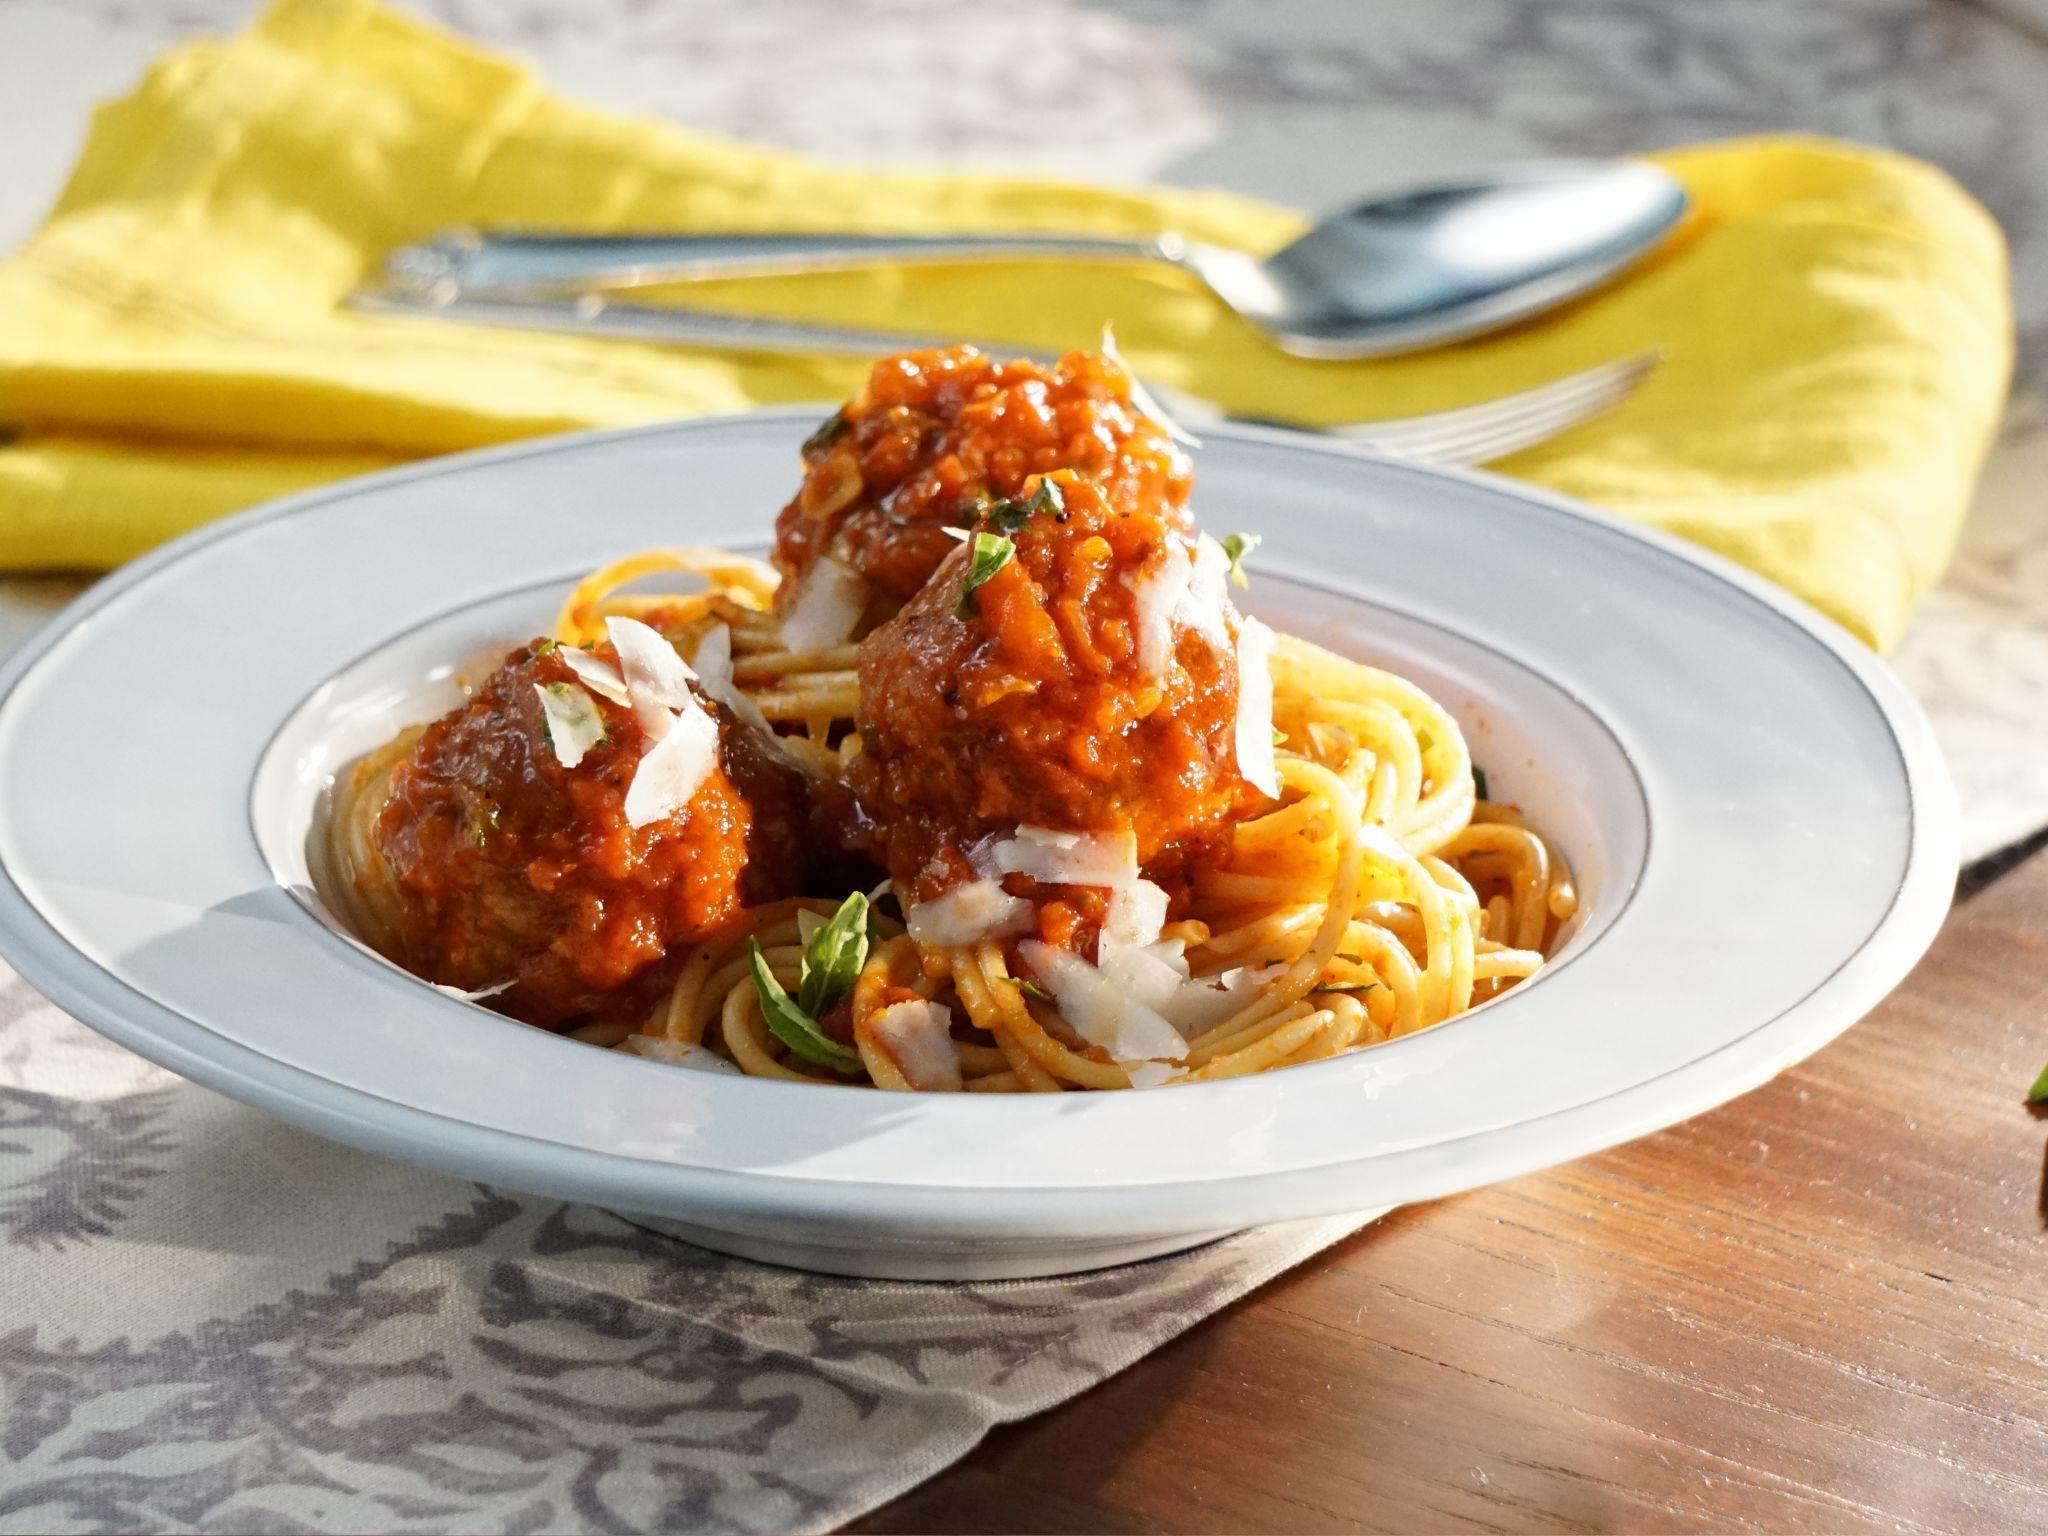 Moms spaghetti and meatballs receta comidas italianas italiano moms spaghetti and meatballs receta comidas italianas italiano y comida forumfinder Choice Image